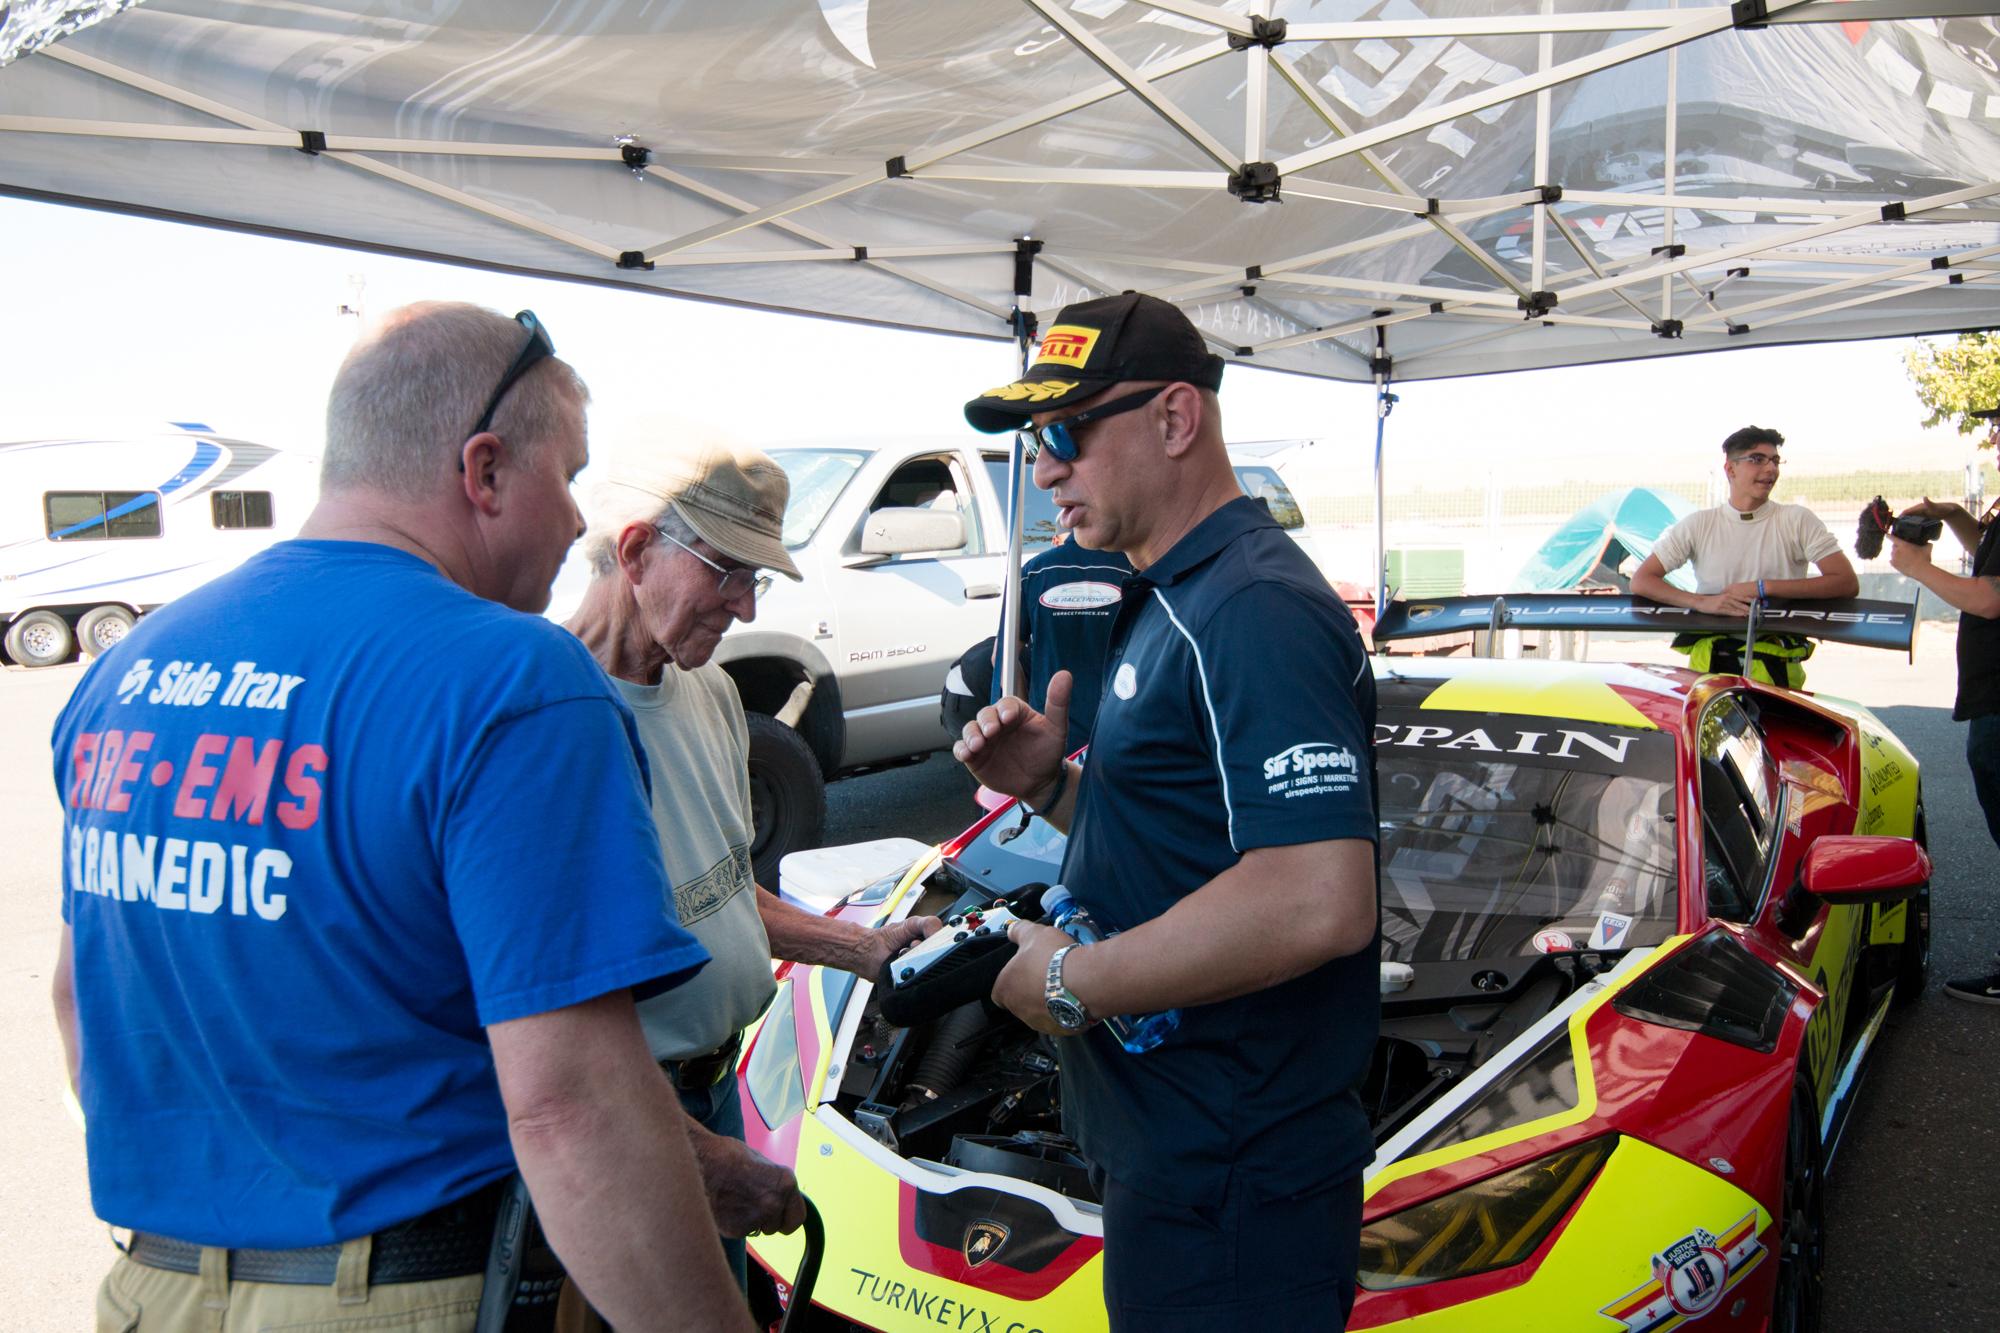 Steven-Racing-20130206-44869.jpg